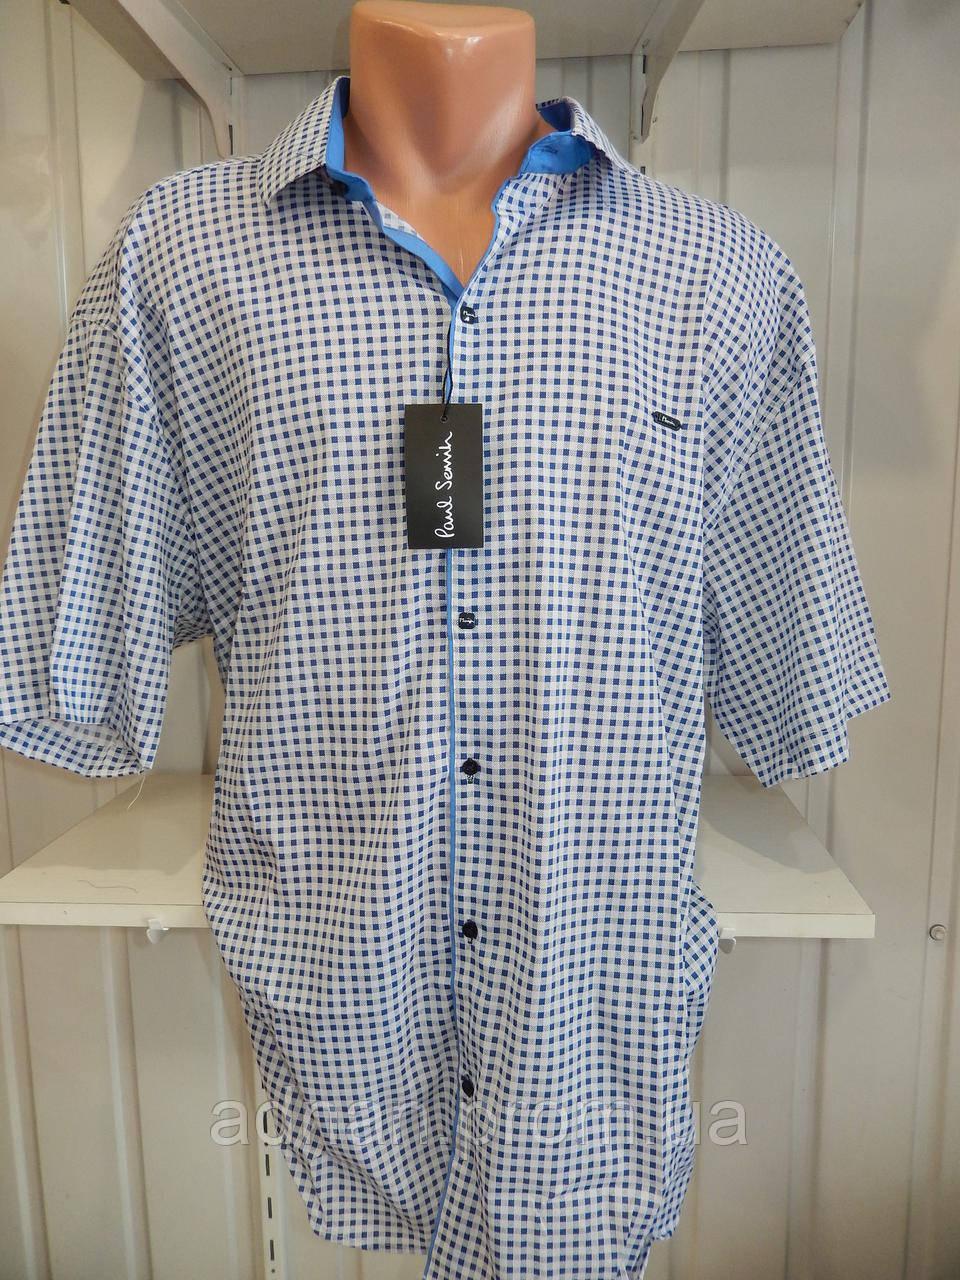 Рубашка мужская Paul Smith супербатал, короткий рукав, стрейч, заклёпки 20.05.2018№1 012\ купить рубашку